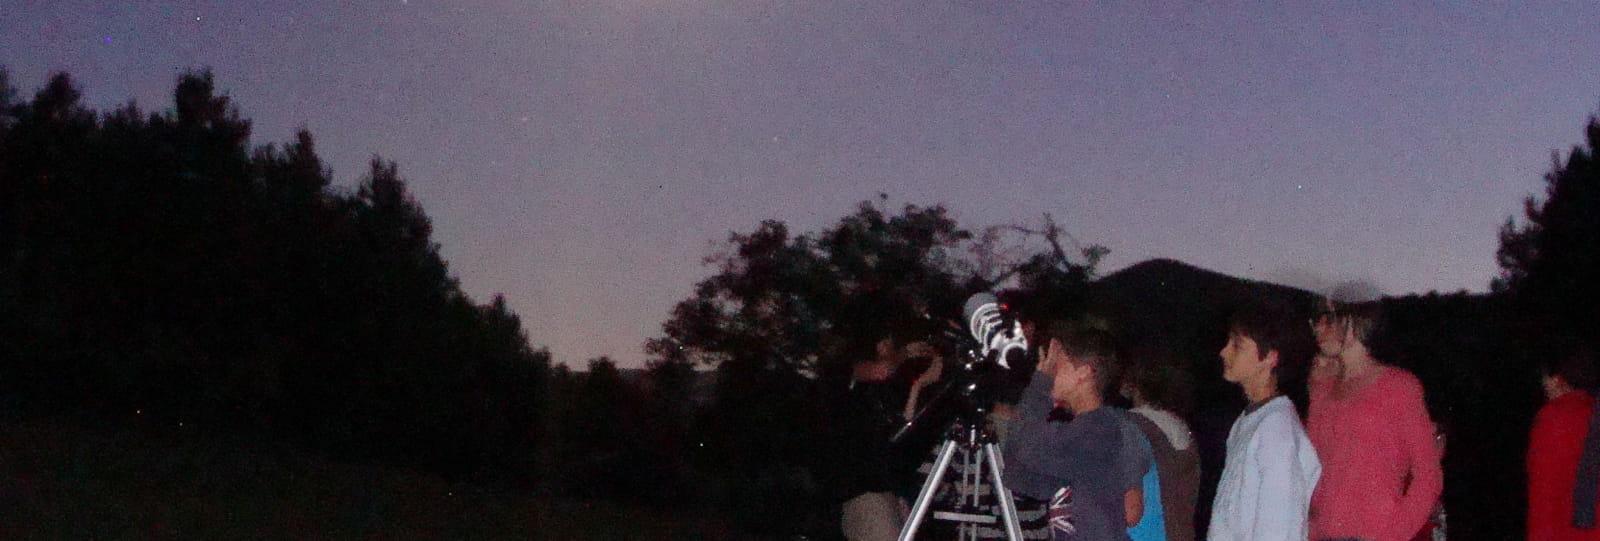 scolaire astronomie iddj drome